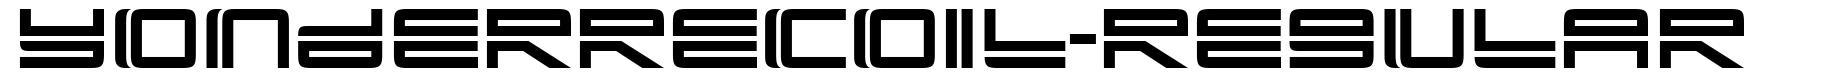 YonderRecoil-Regular font